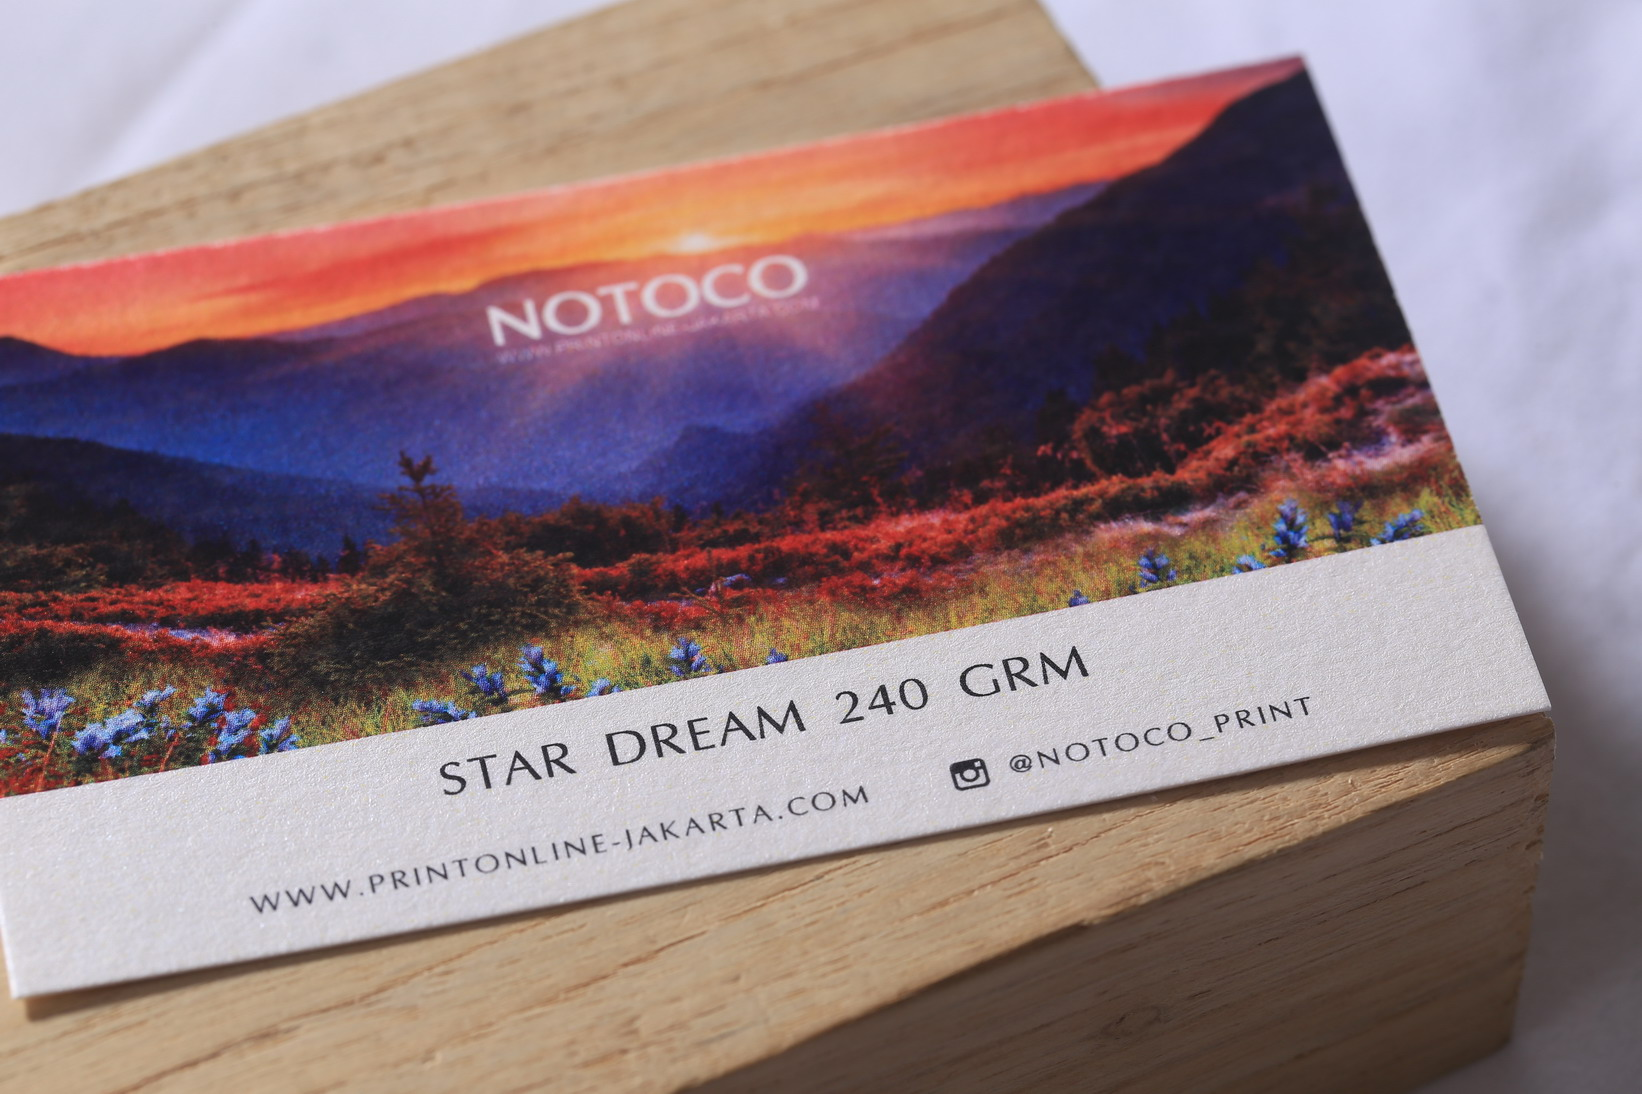 Star Dream 240 grm